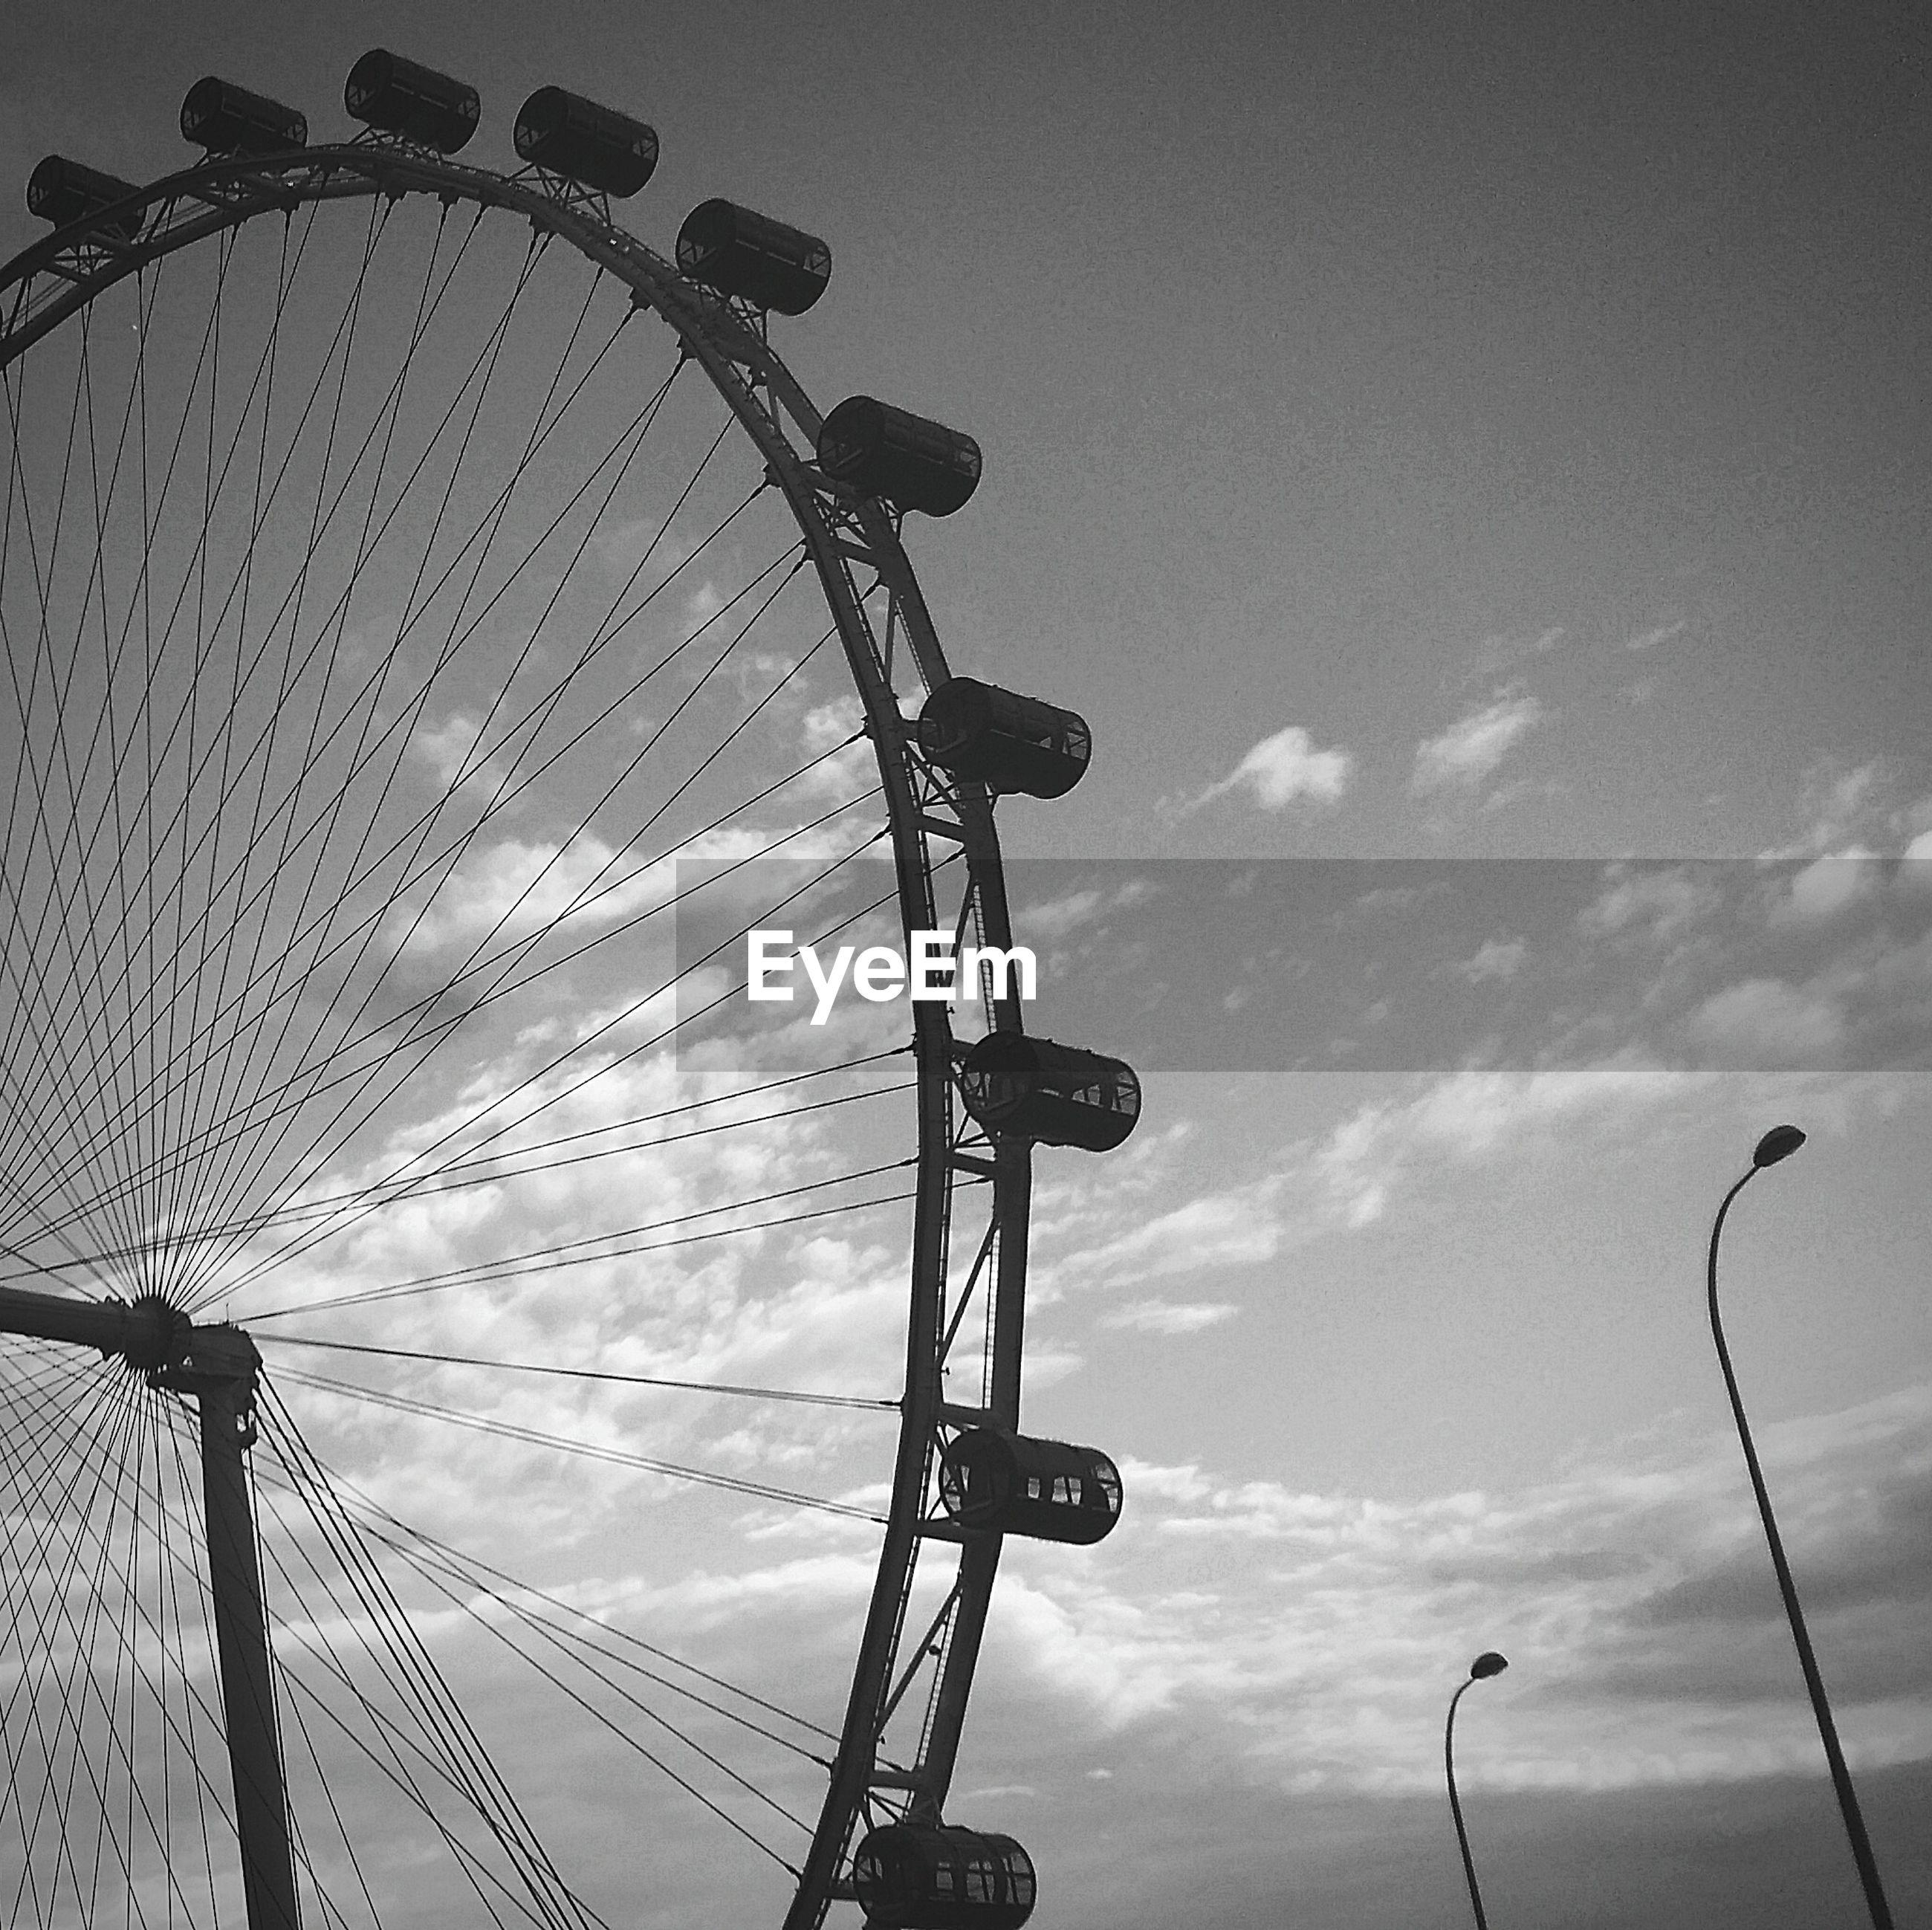 ferris wheel, amusement park, amusement park ride, arts culture and entertainment, low angle view, sky, silhouette, tall - high, outdoors, dusk, metal, enjoyment, big wheel, cloud - sky, fairground, chain swing ride, fun, cloud, large, no people